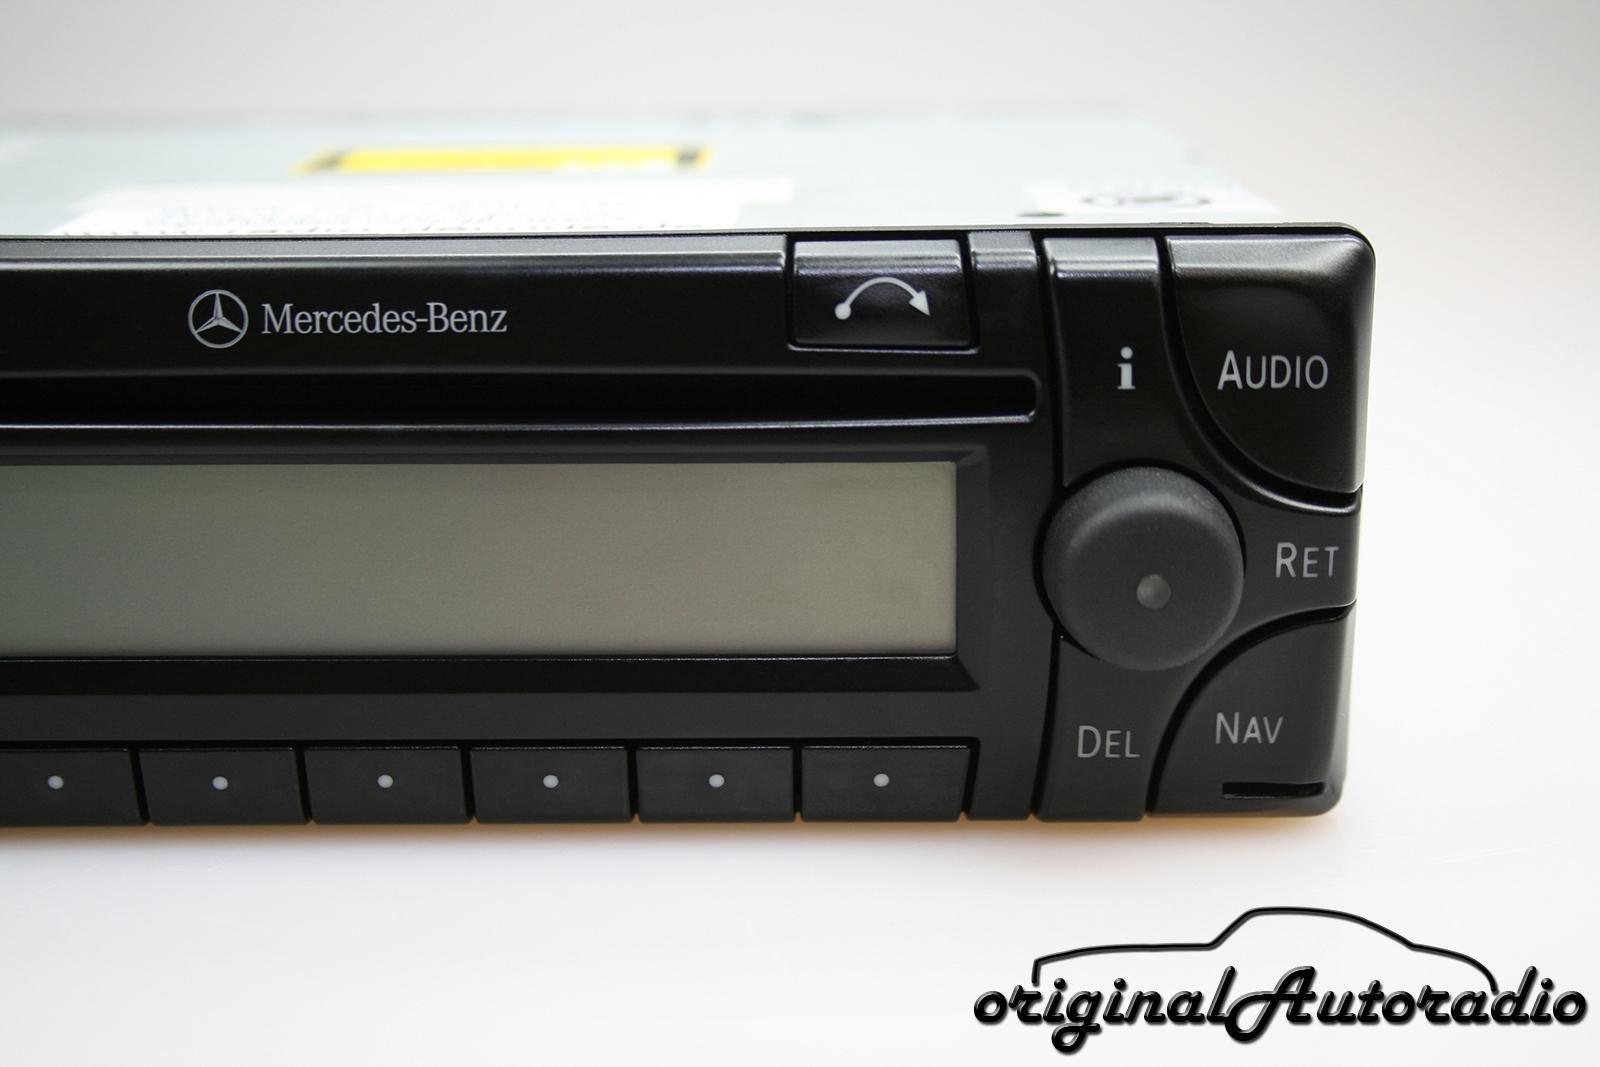 Original-Autoradio de - Mercedes Audio 30 APS BE4716 Becker